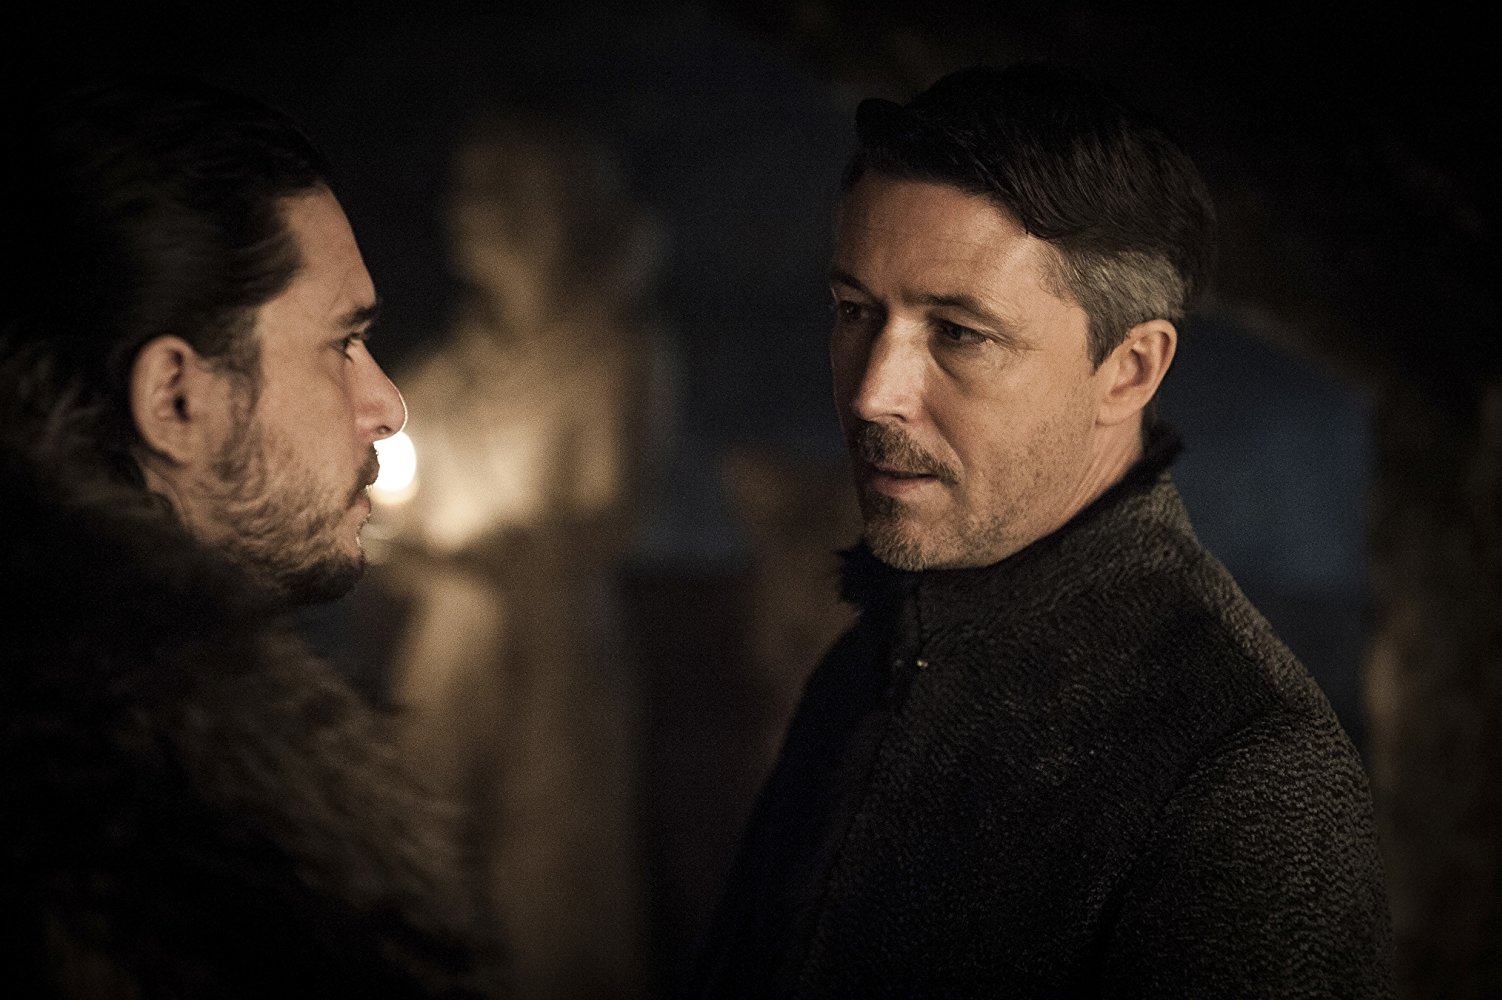 Petyr 'Littlefinger' Baelish